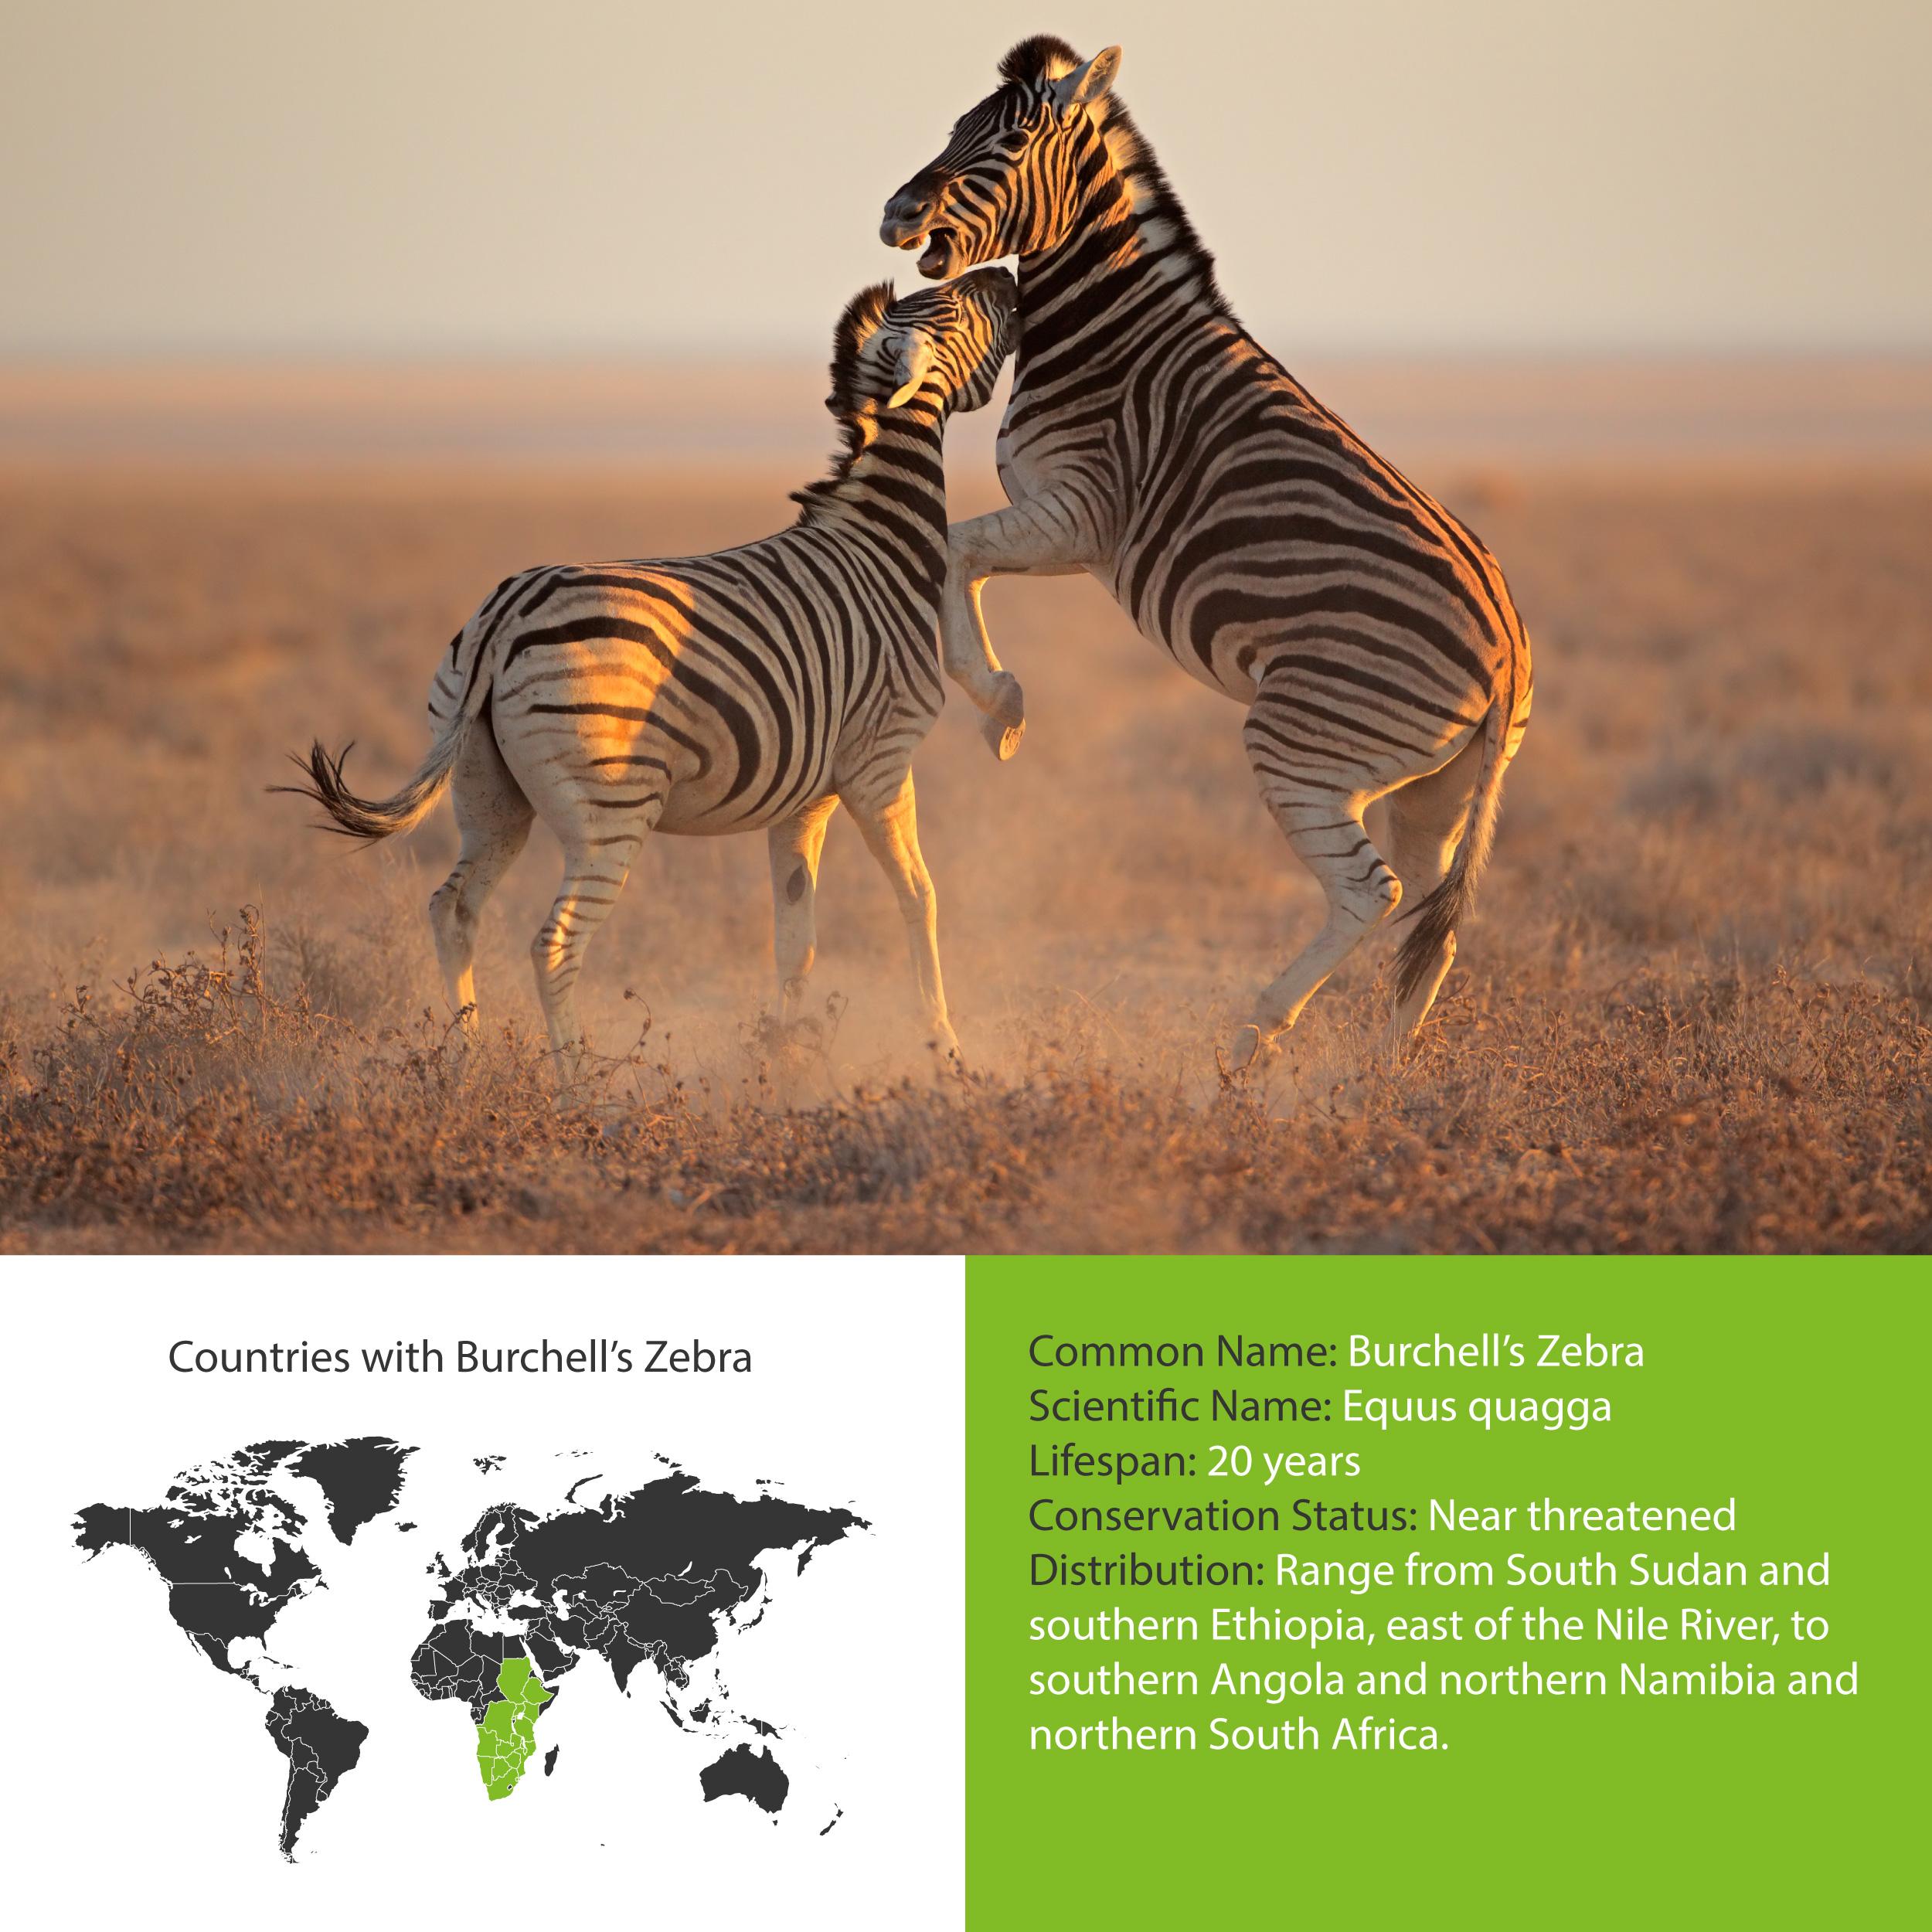 Burchell's Zebra Distribution